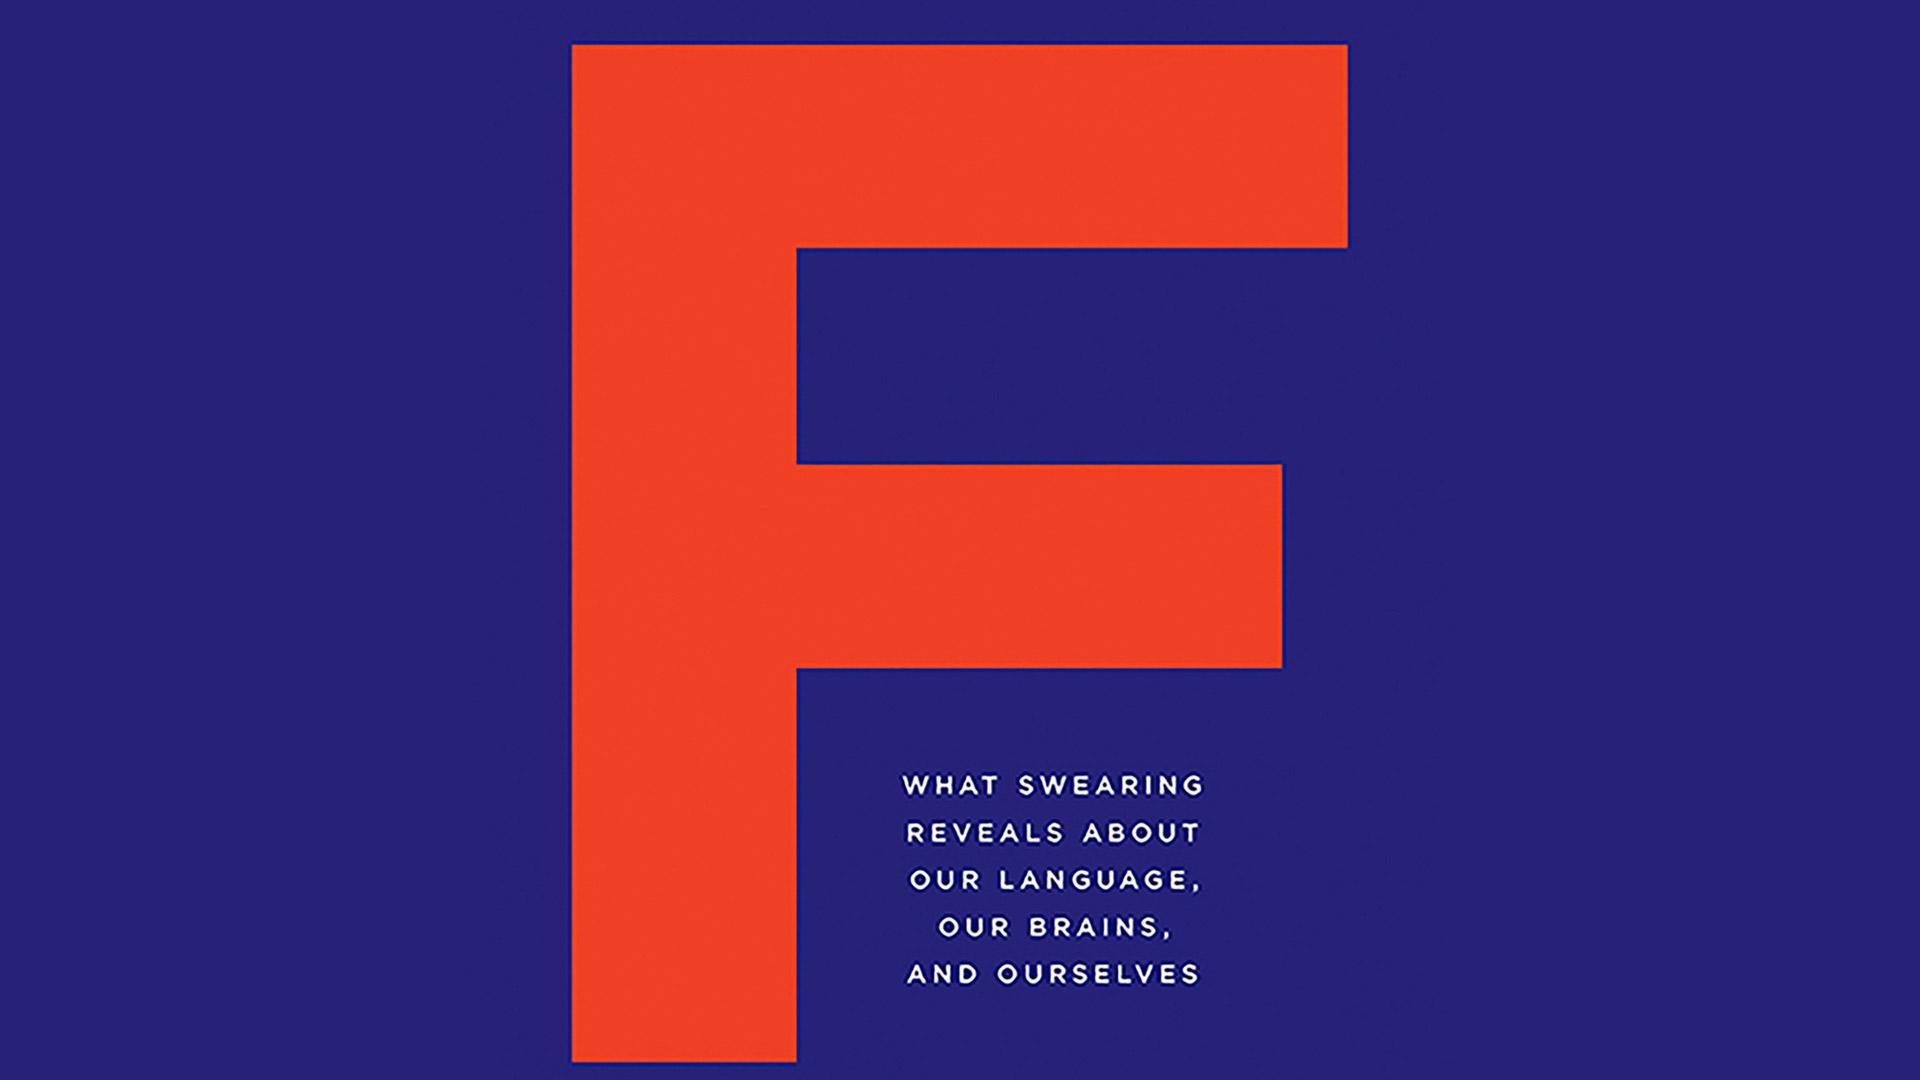 Professor Benjamin K. Bergen Talks F-Words, Swearing and Brains